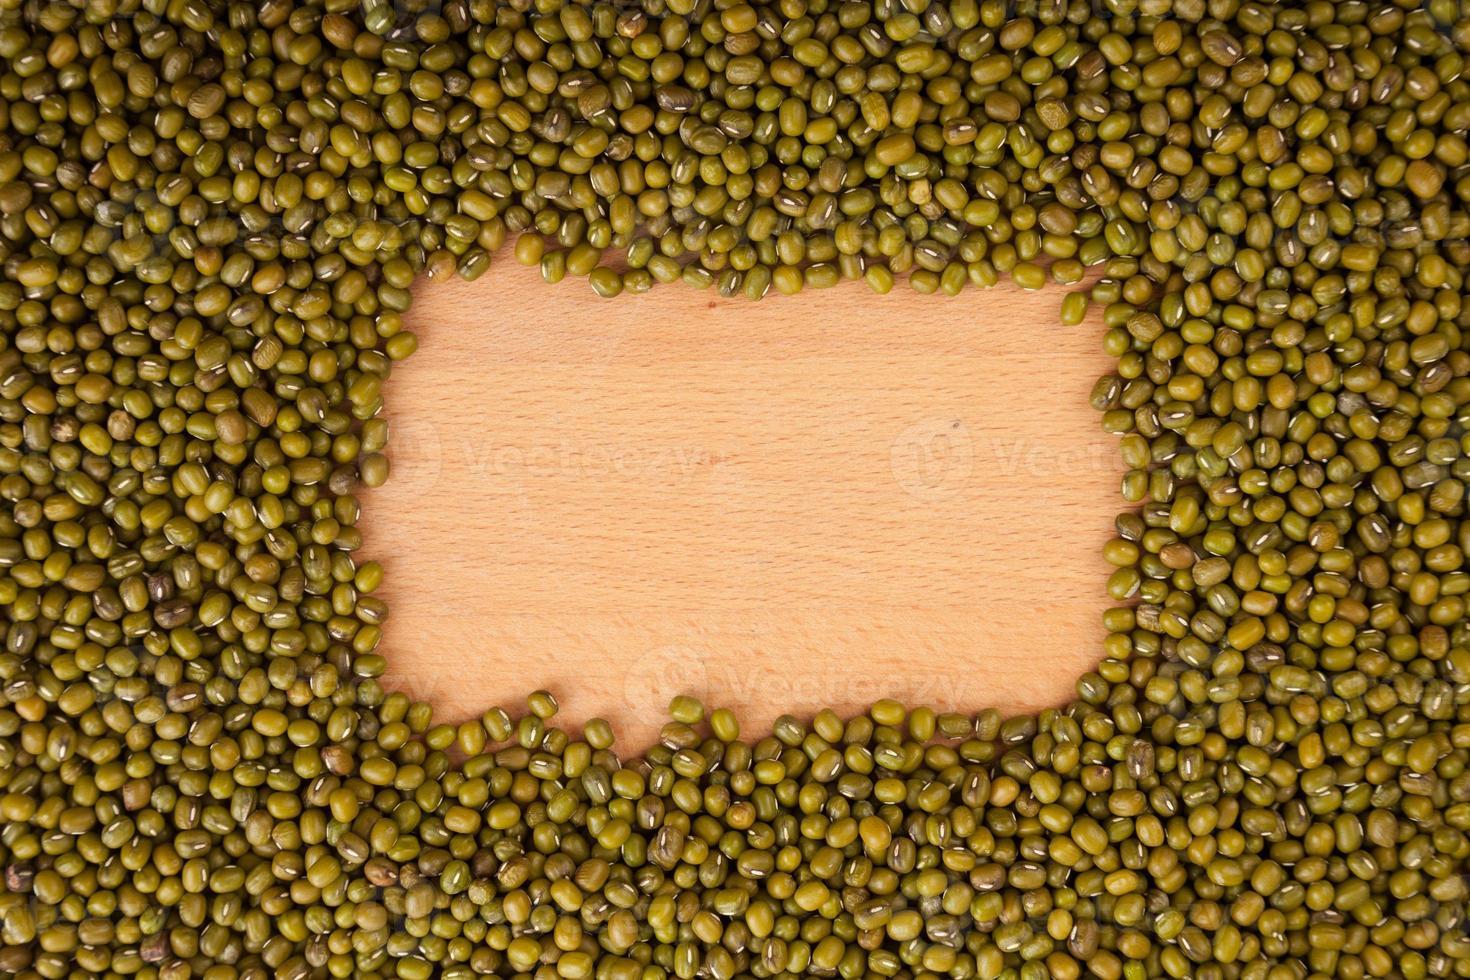 haricots mungo avec espace copie rectangulaire photo